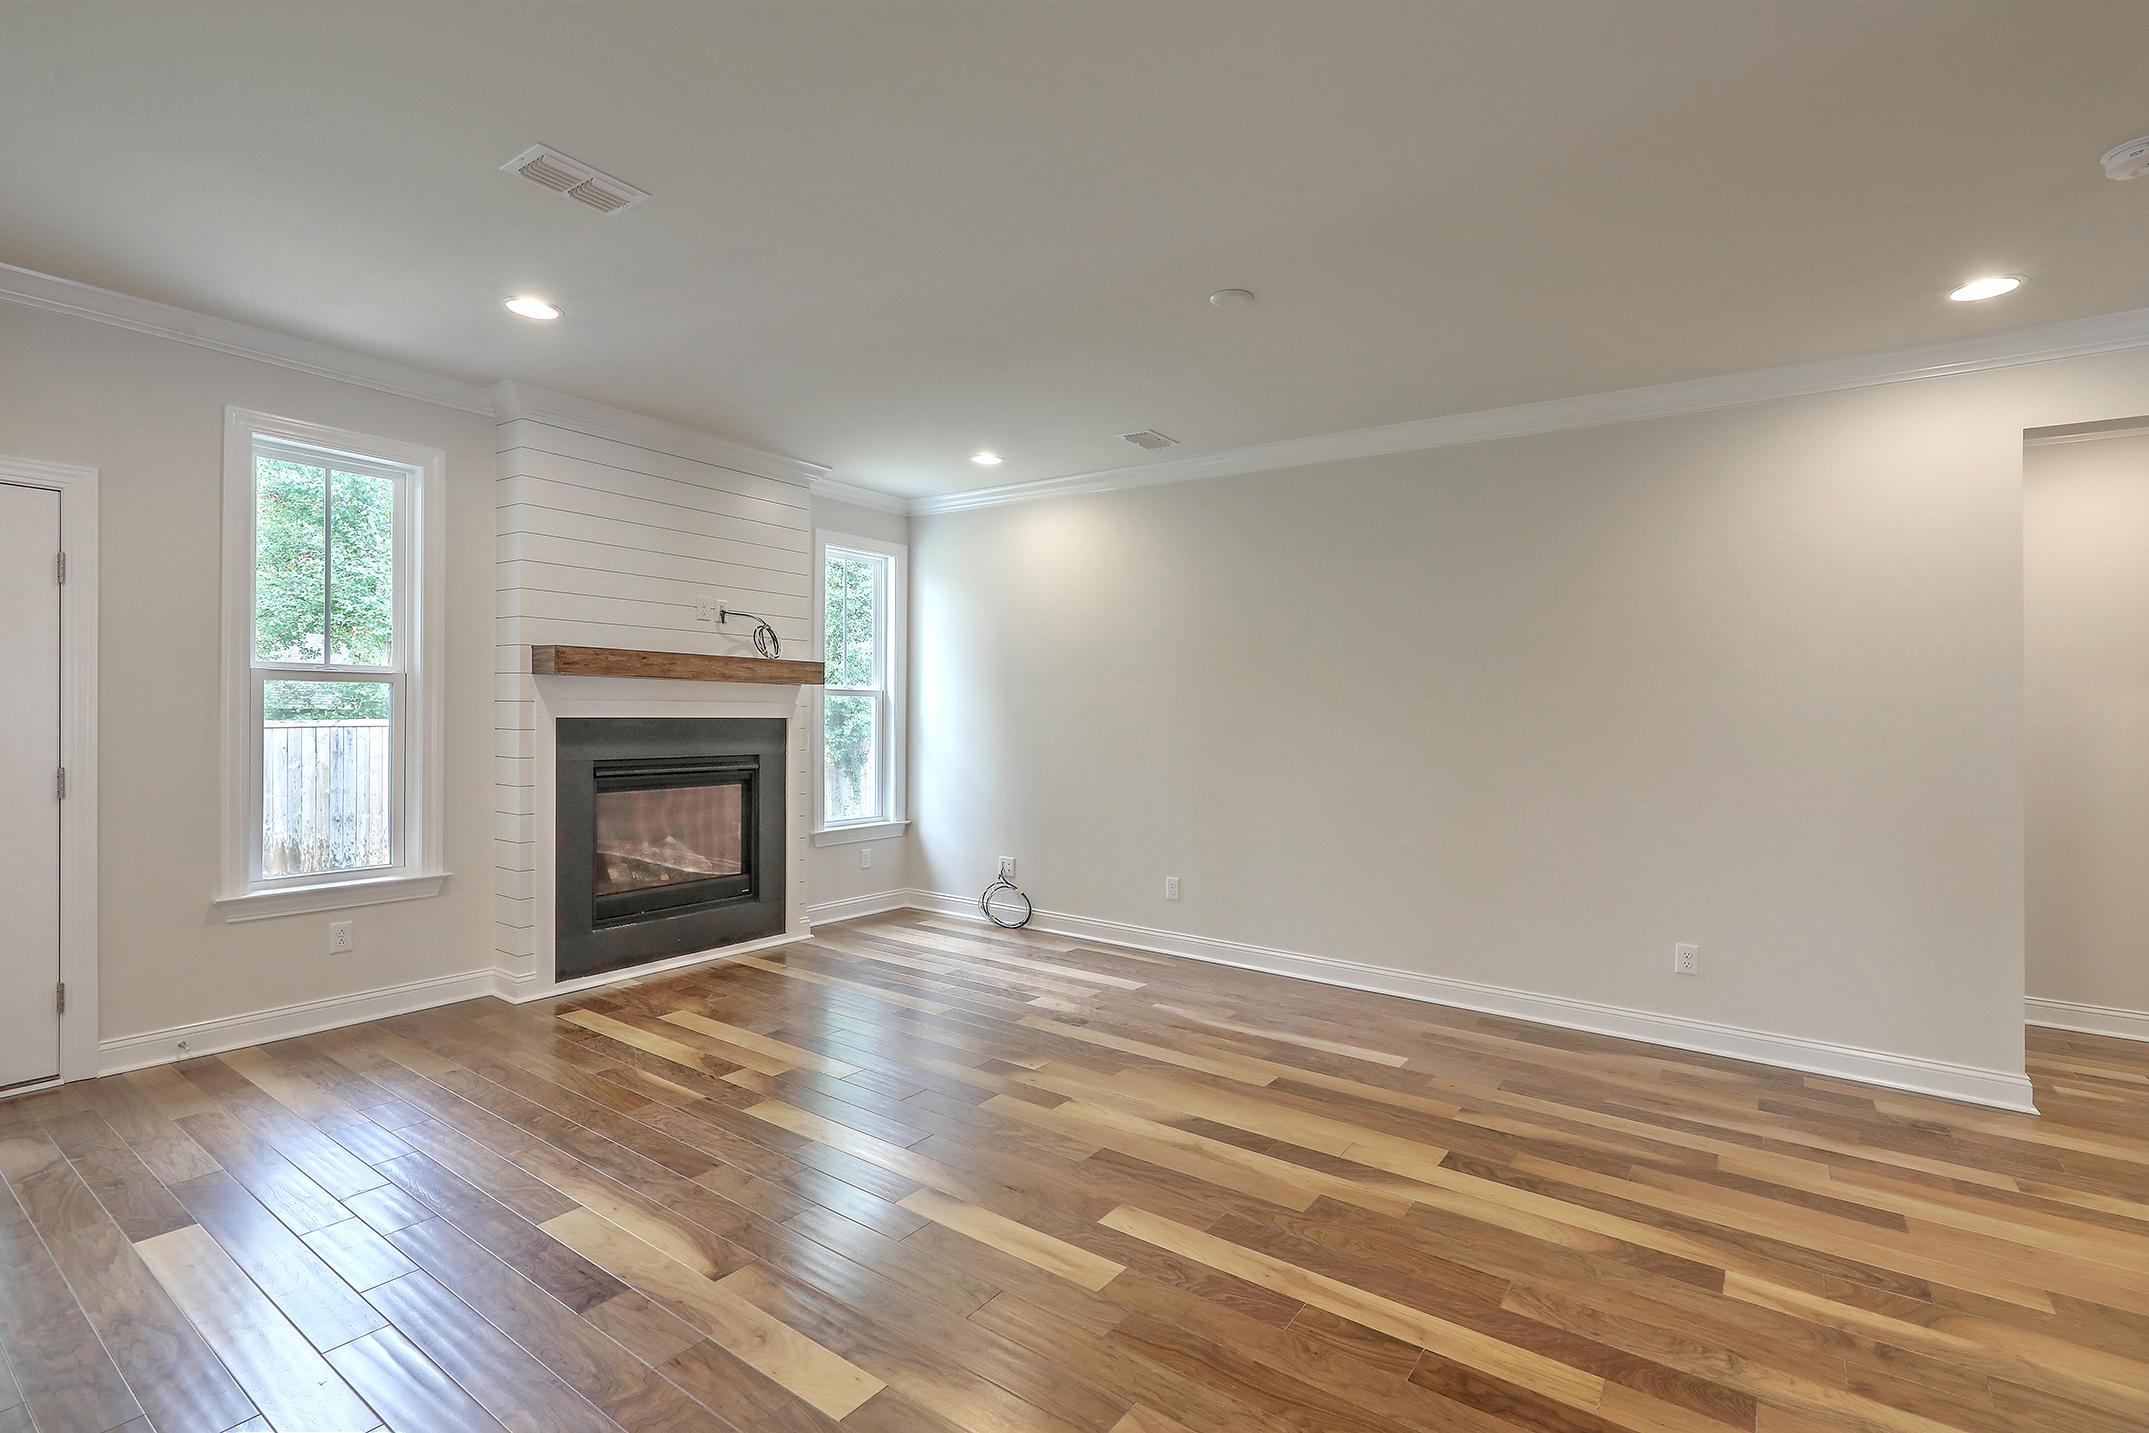 Bentley Park Homes For Sale - 1277 Gannett, Mount Pleasant, SC - 24